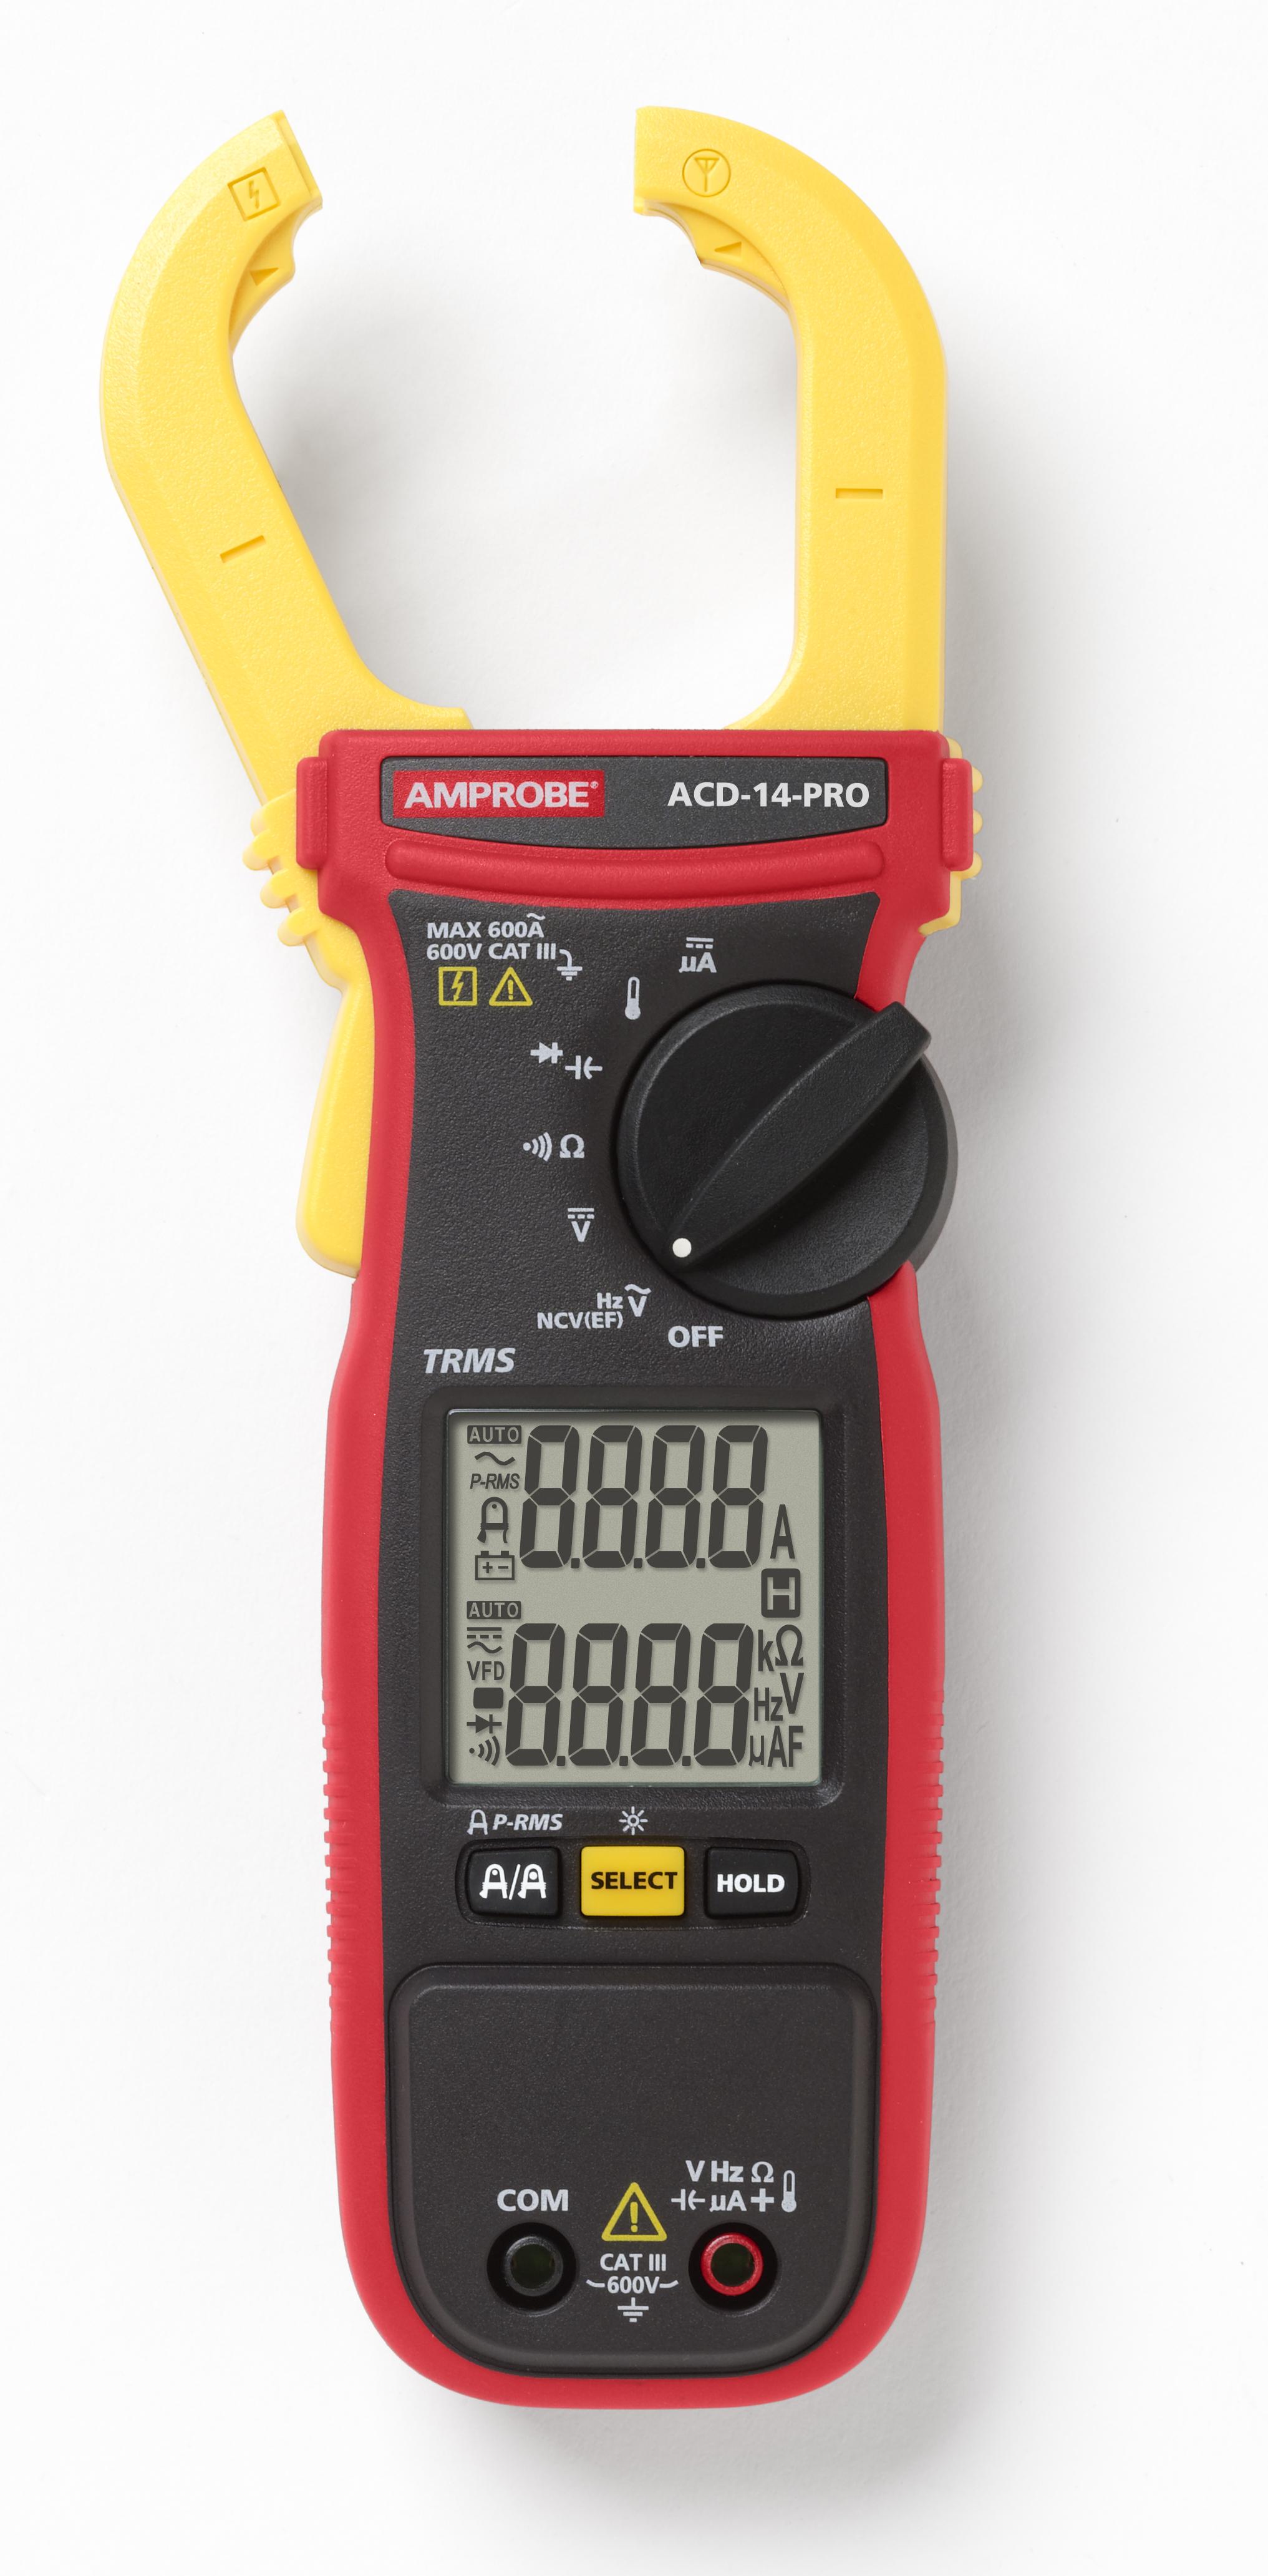 Amprobe® ACD-14-PRO